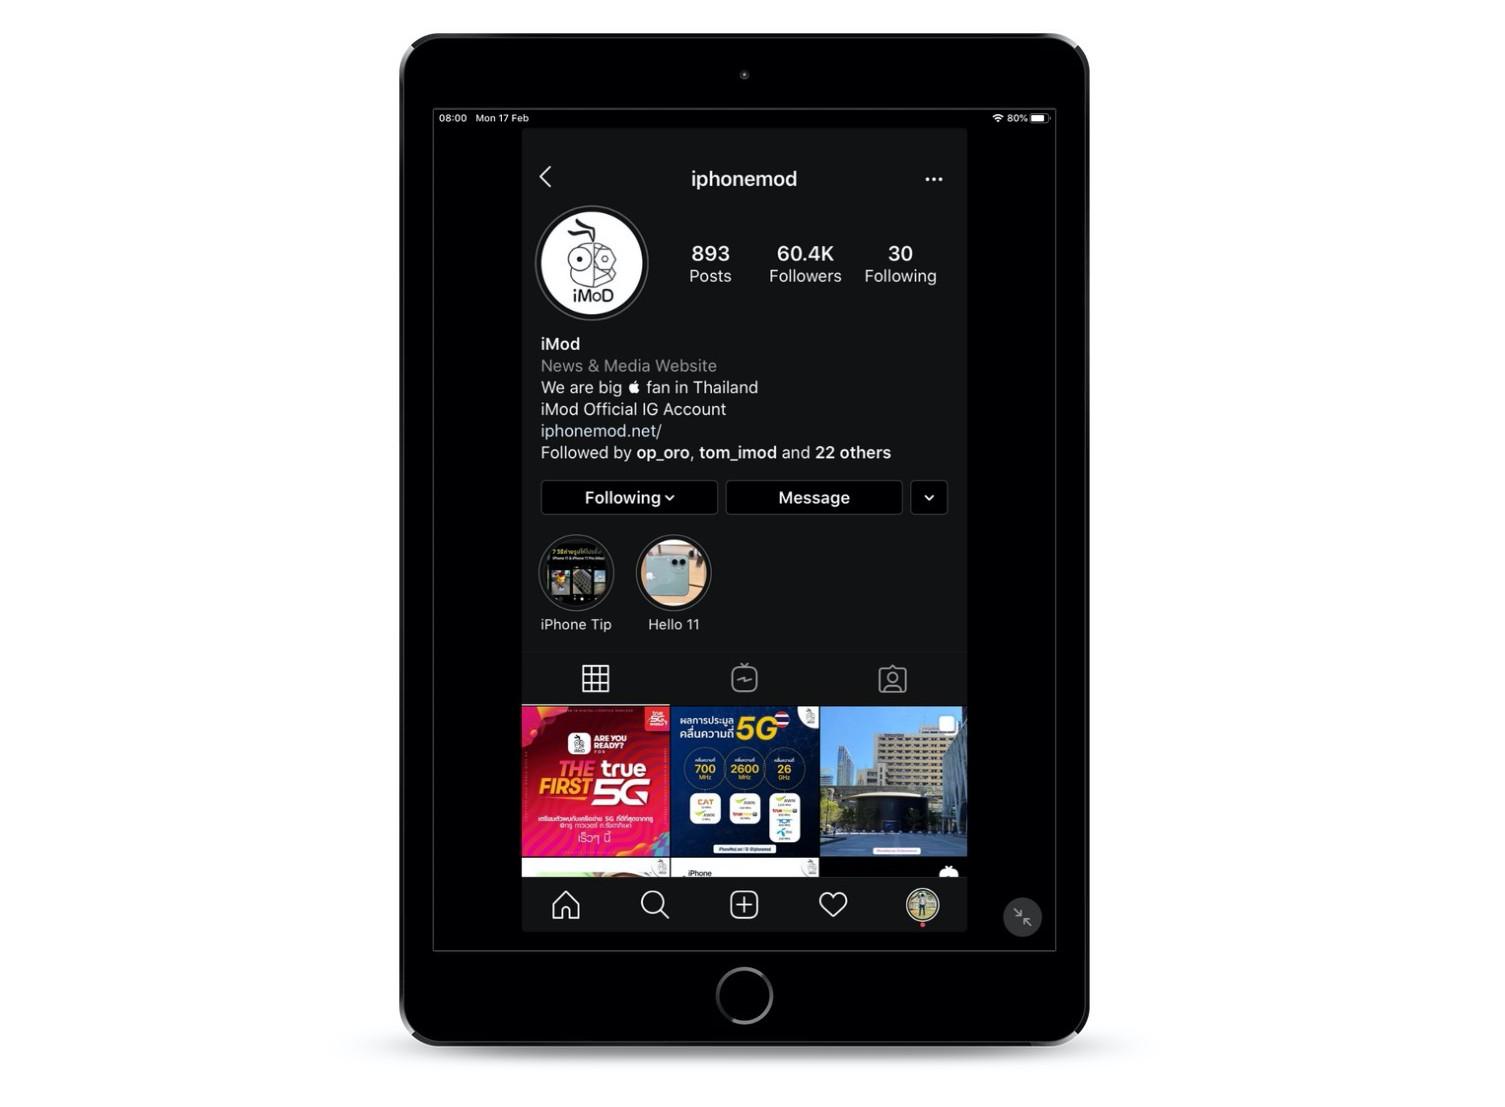 Instagram Ceo Explain Why No Ipad App Img 2